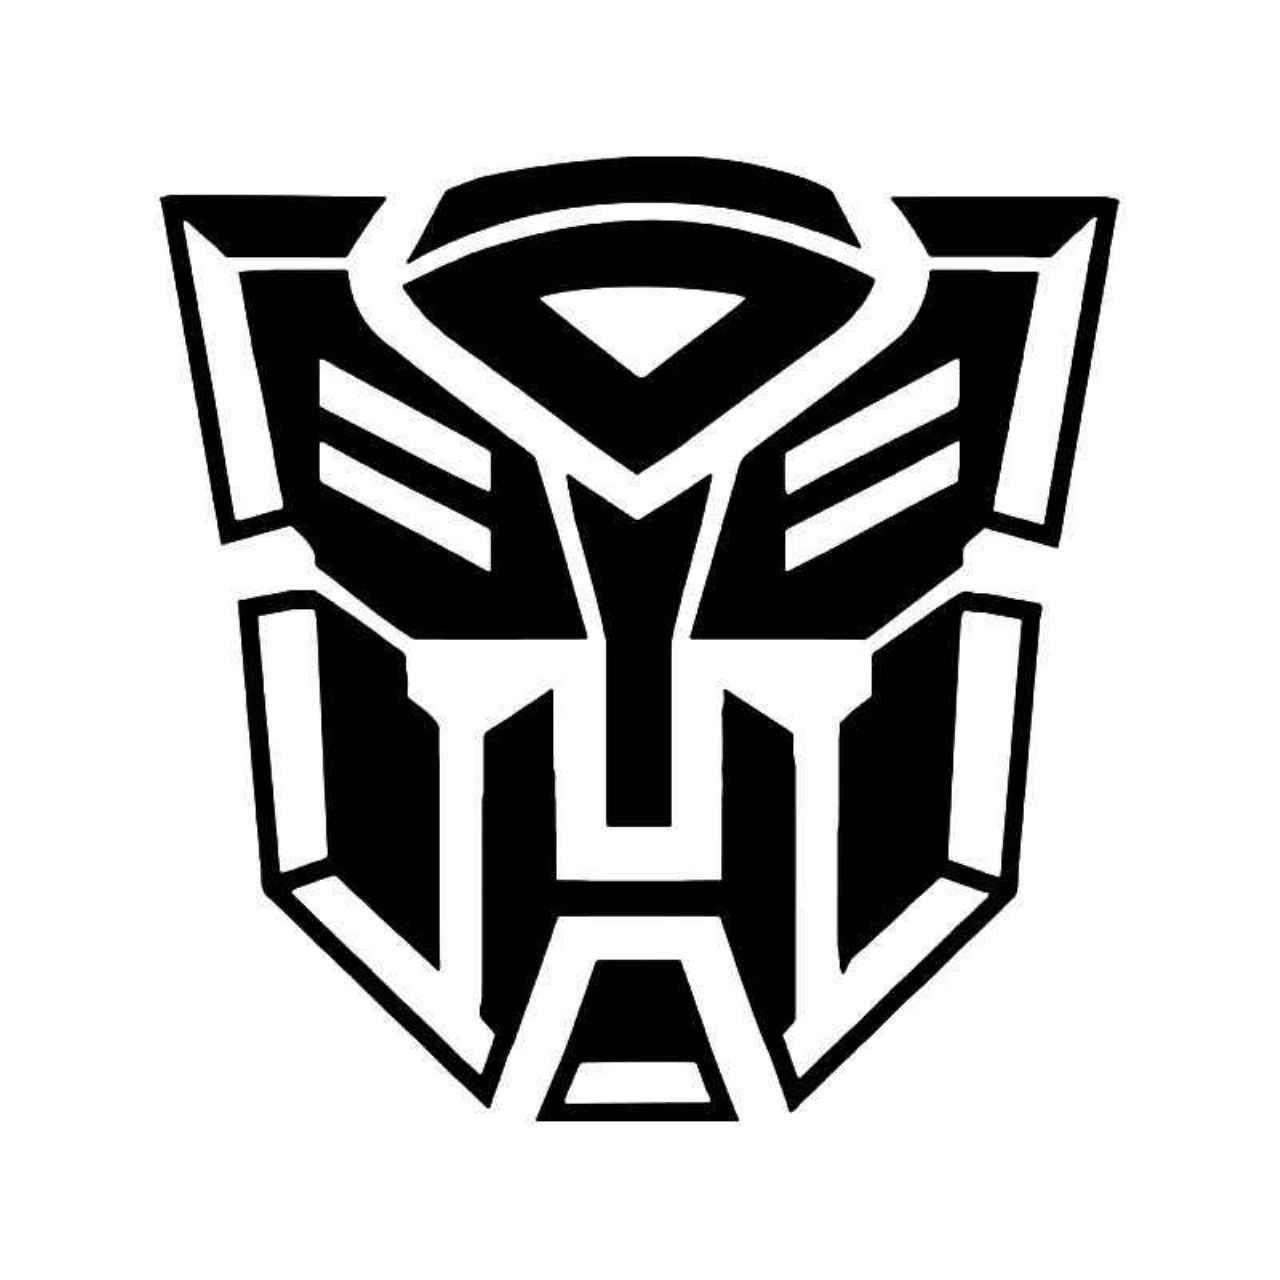 Transformers Autobots Vinyl Die Cut Car Decal Sticker FREE SHIPPING